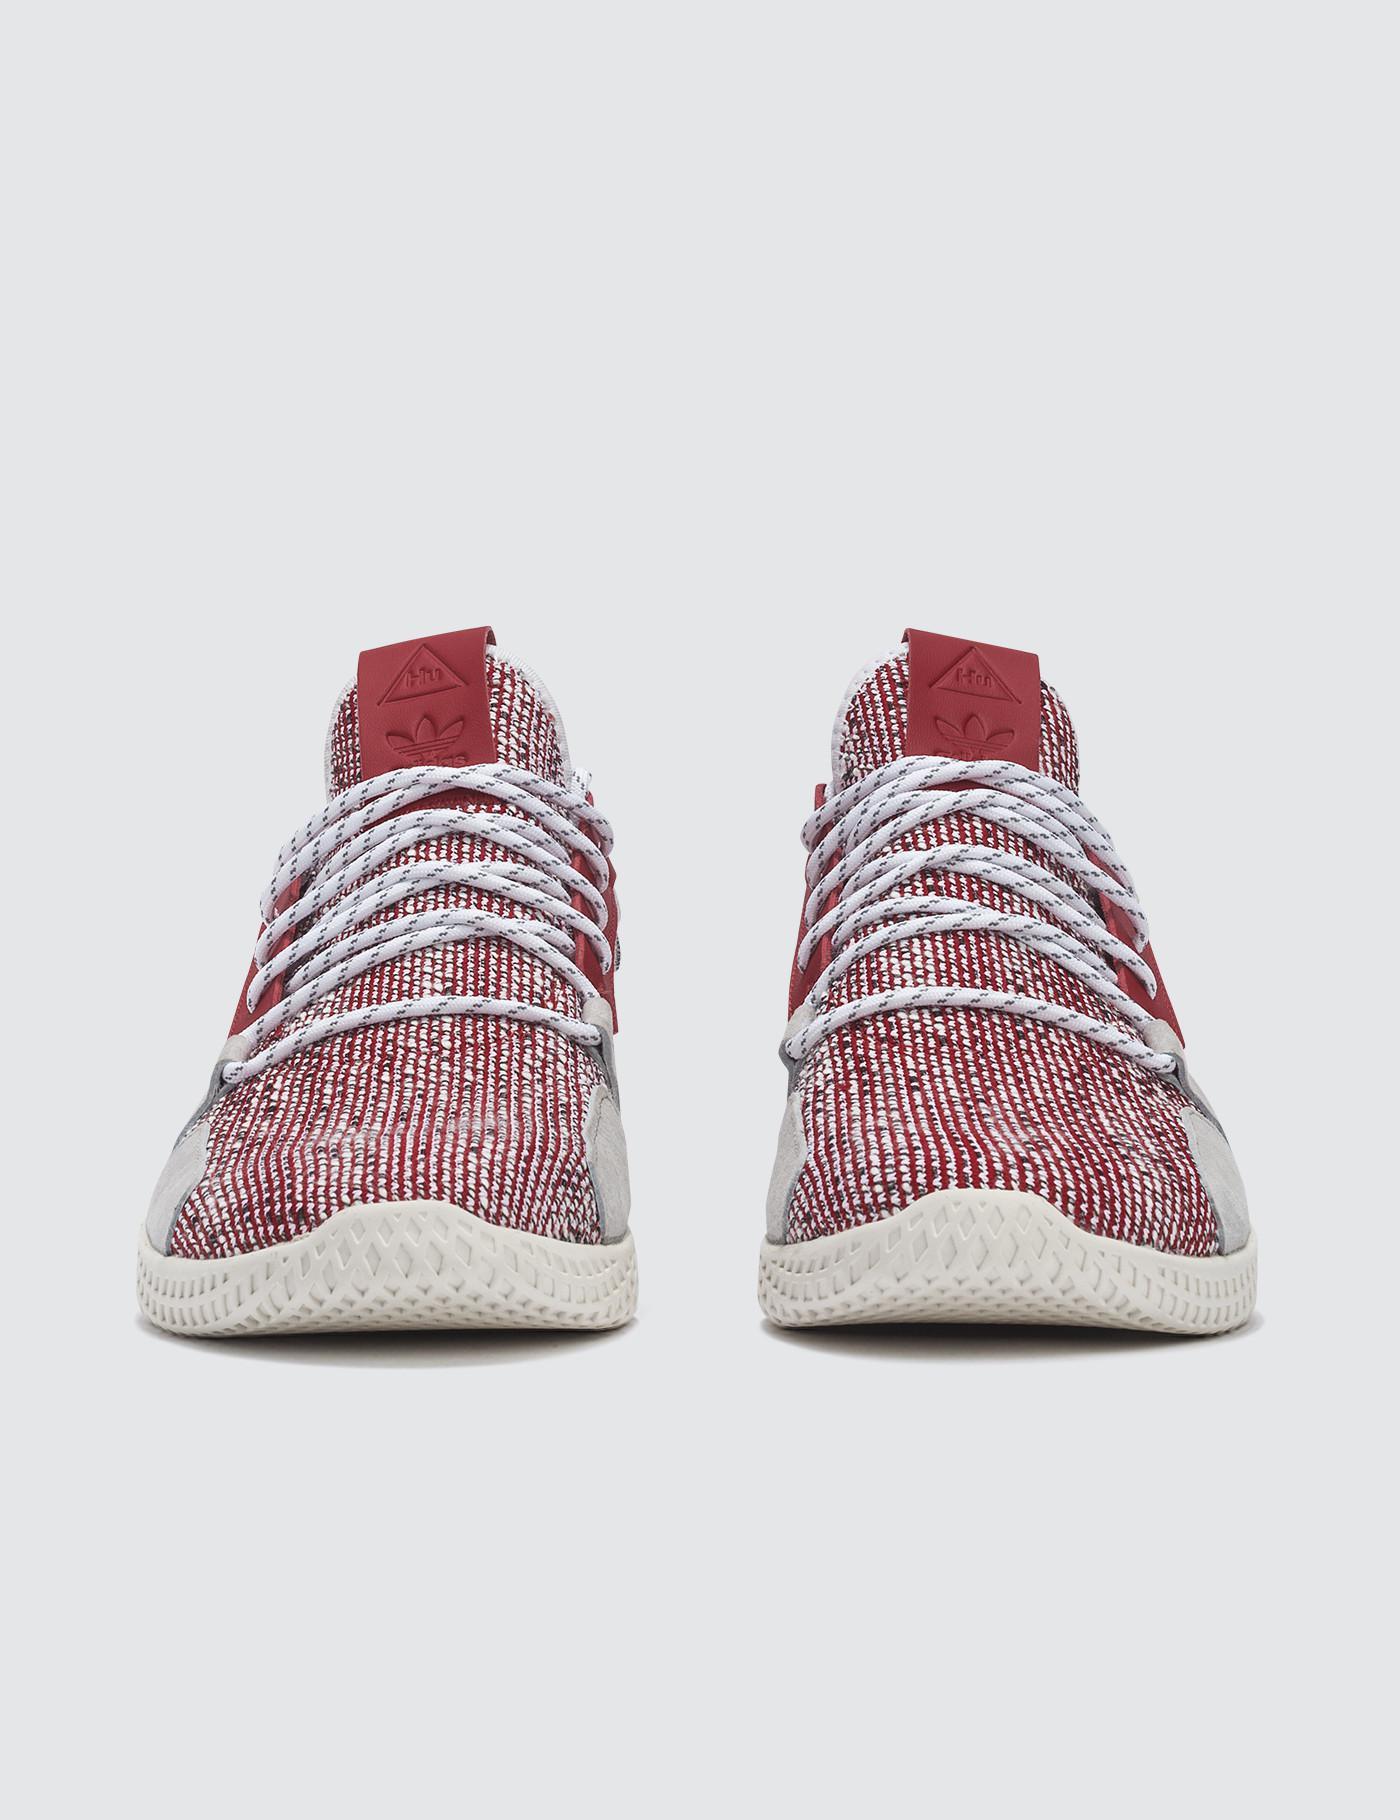 innovative design 5f934 966f8 adidas Originals Pharrell Williams X Adidas Solar Hu Tennis V2 in Red - Lyst